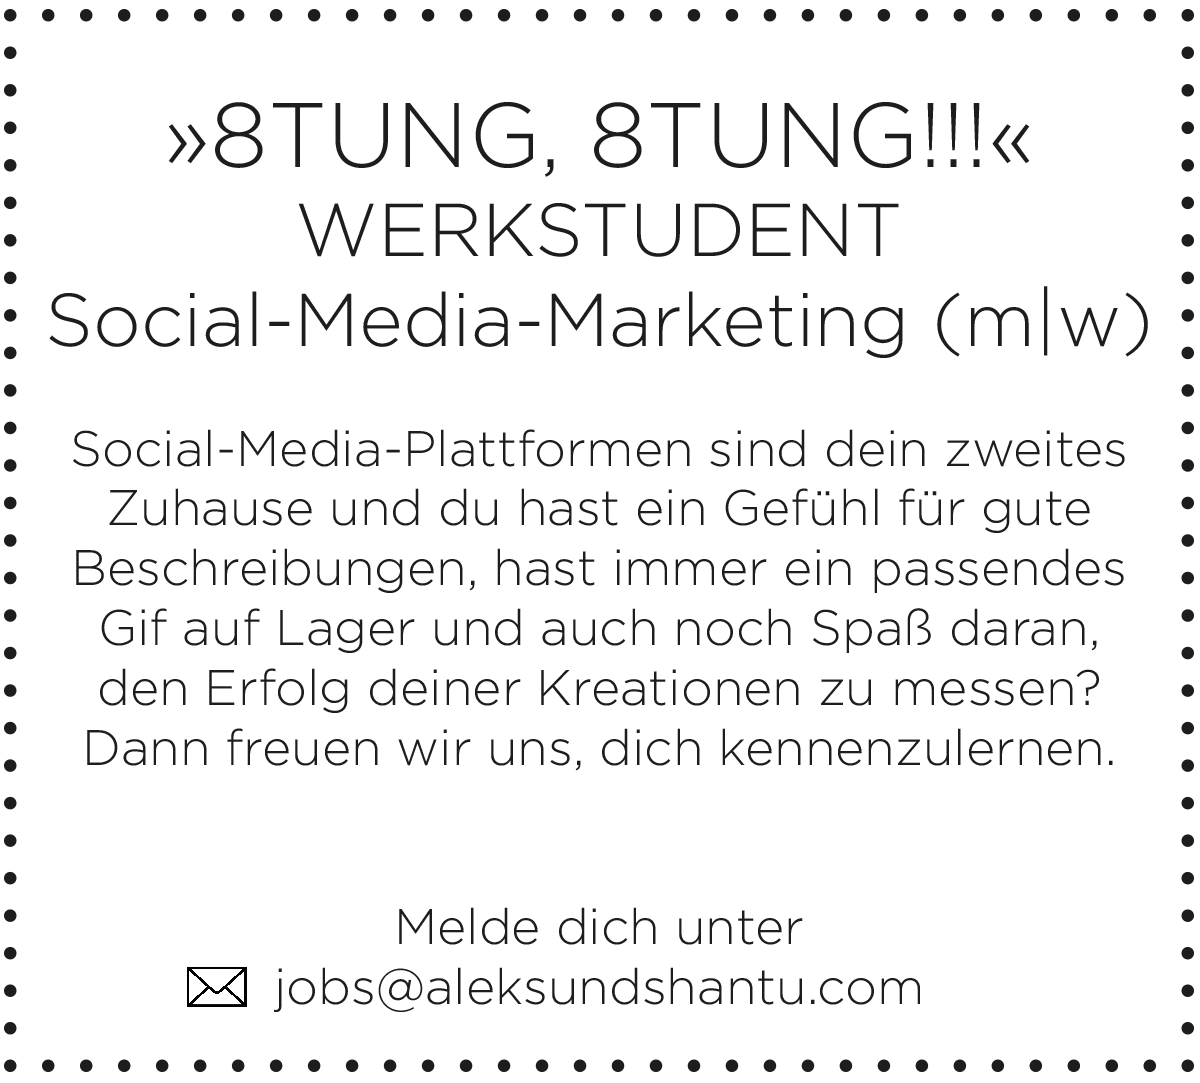 Jobbeschreibung/Anzeige Werkstudent*in Social-Media-Marketing